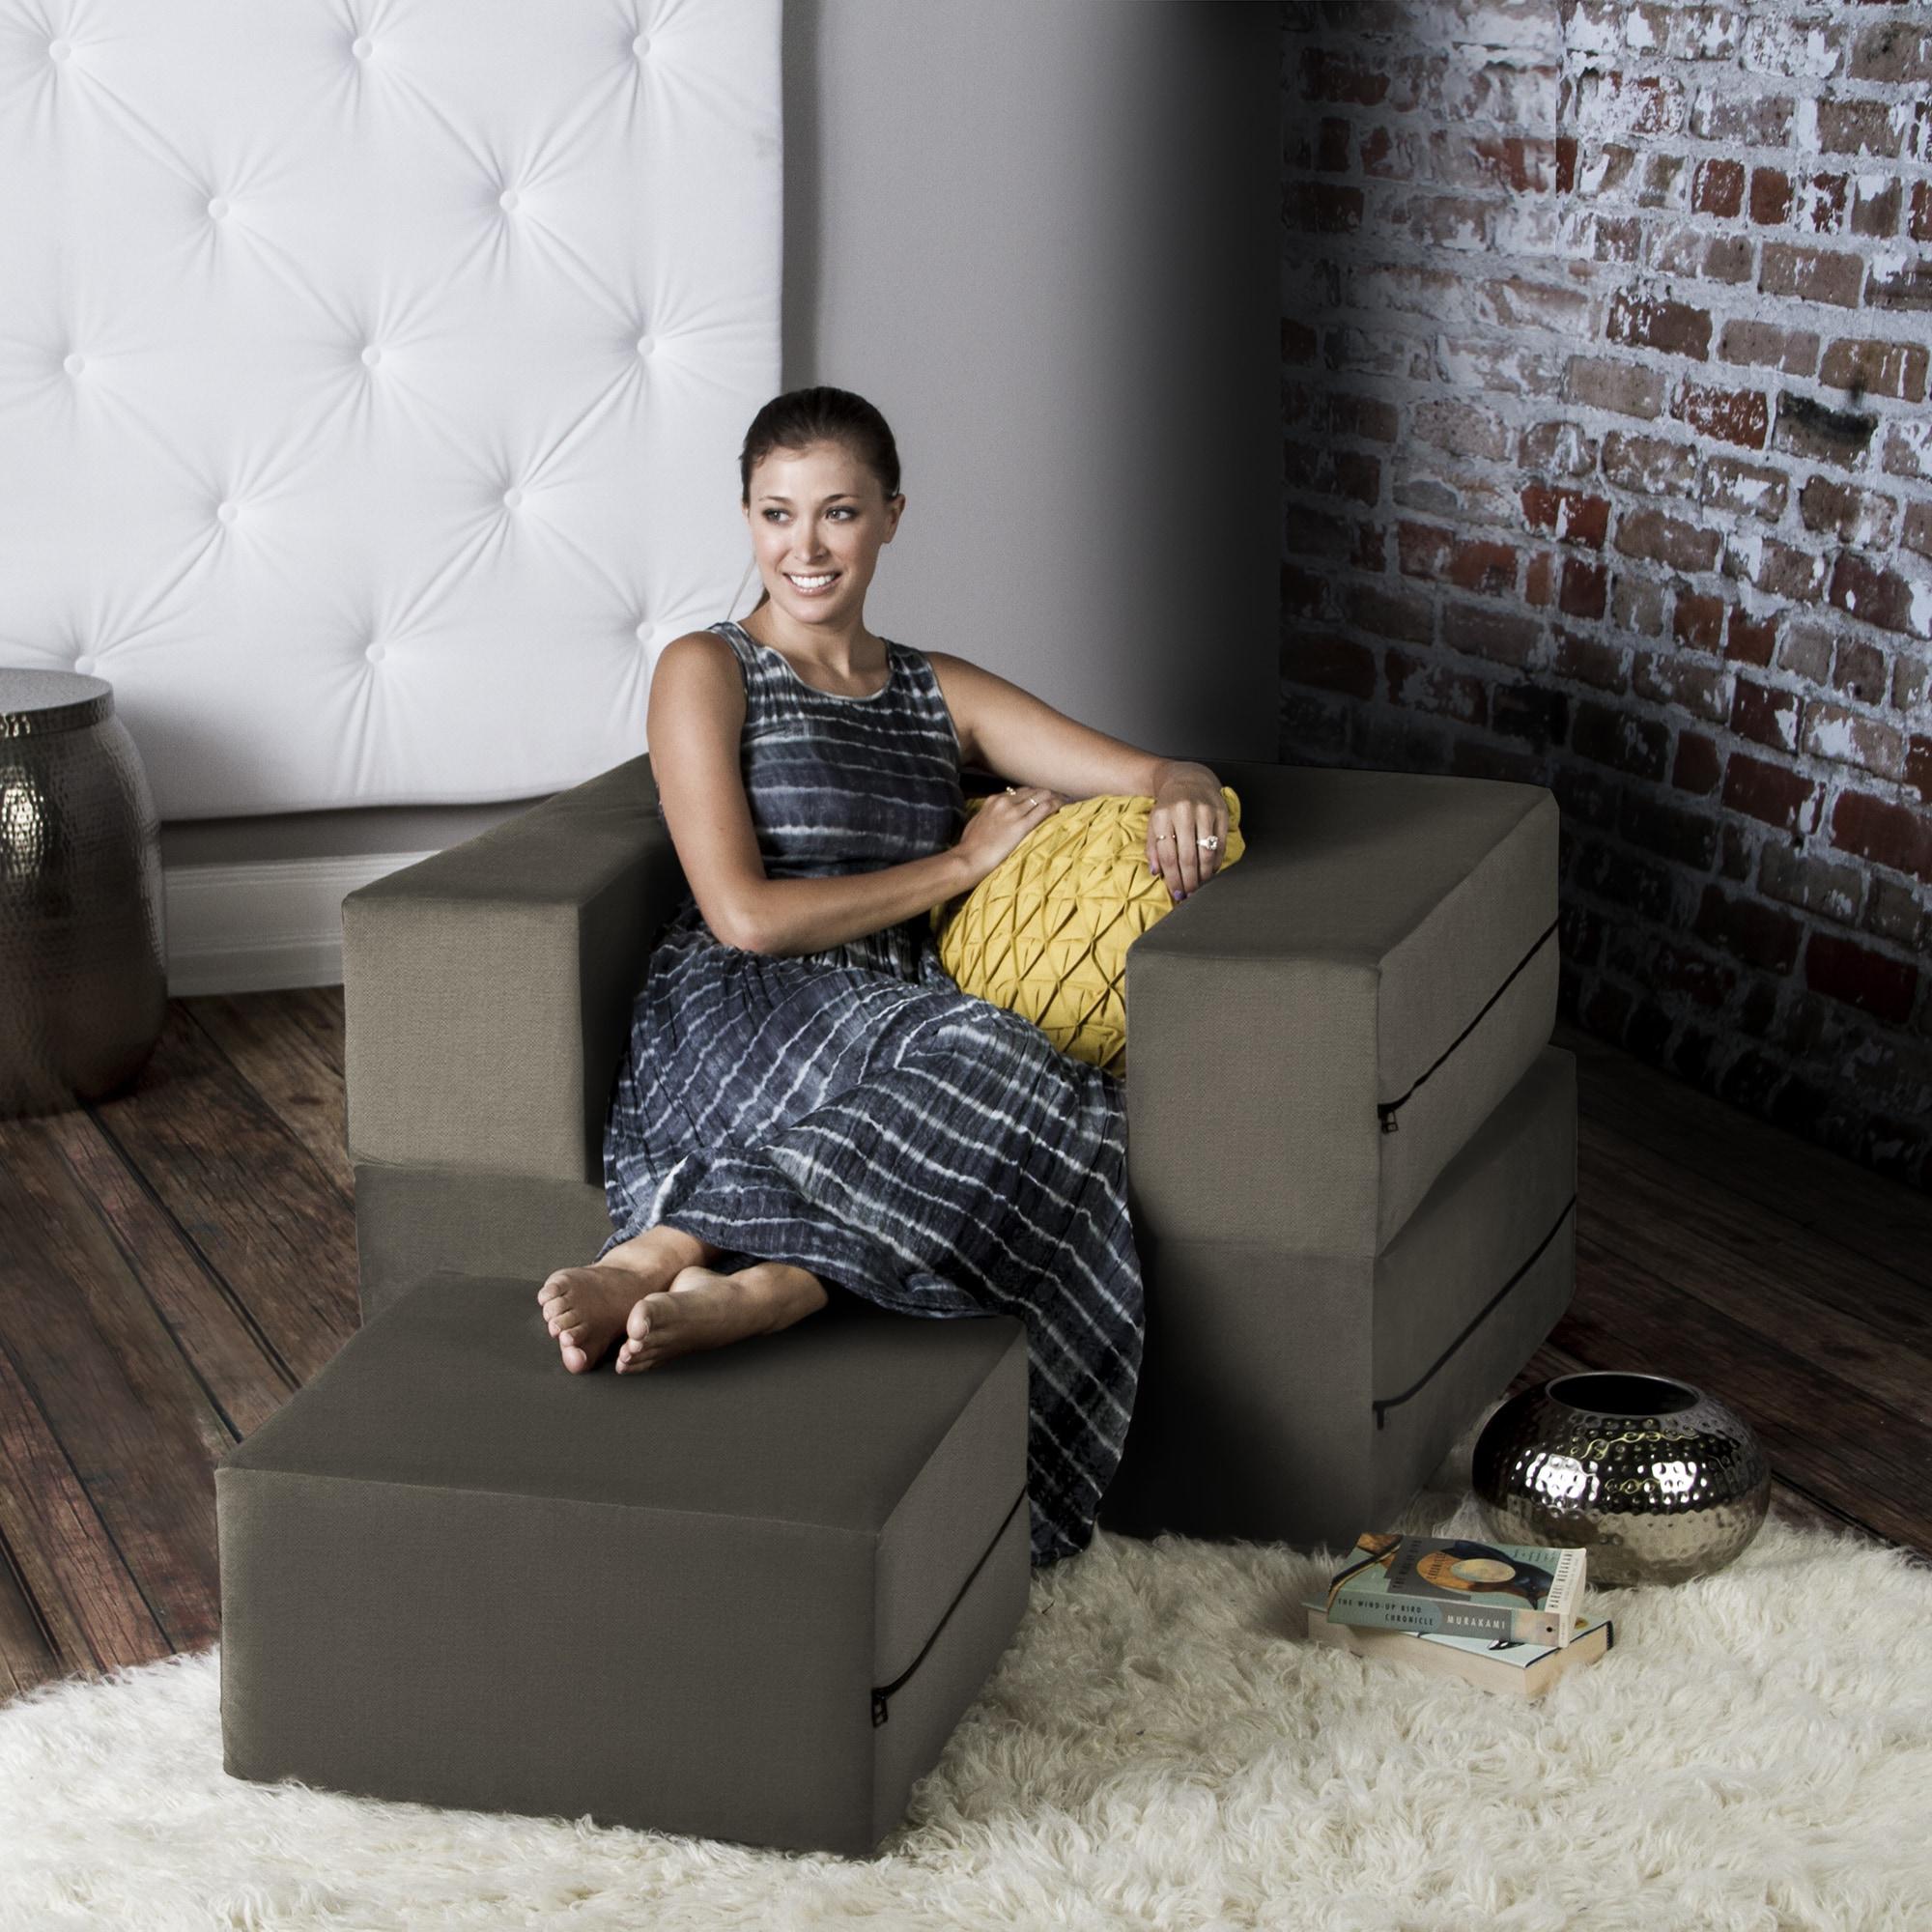 Mocha / 16385 Jaxx Zipline Convertible Sleeper Futon Chair & Ottoman (Twin Bed) 0